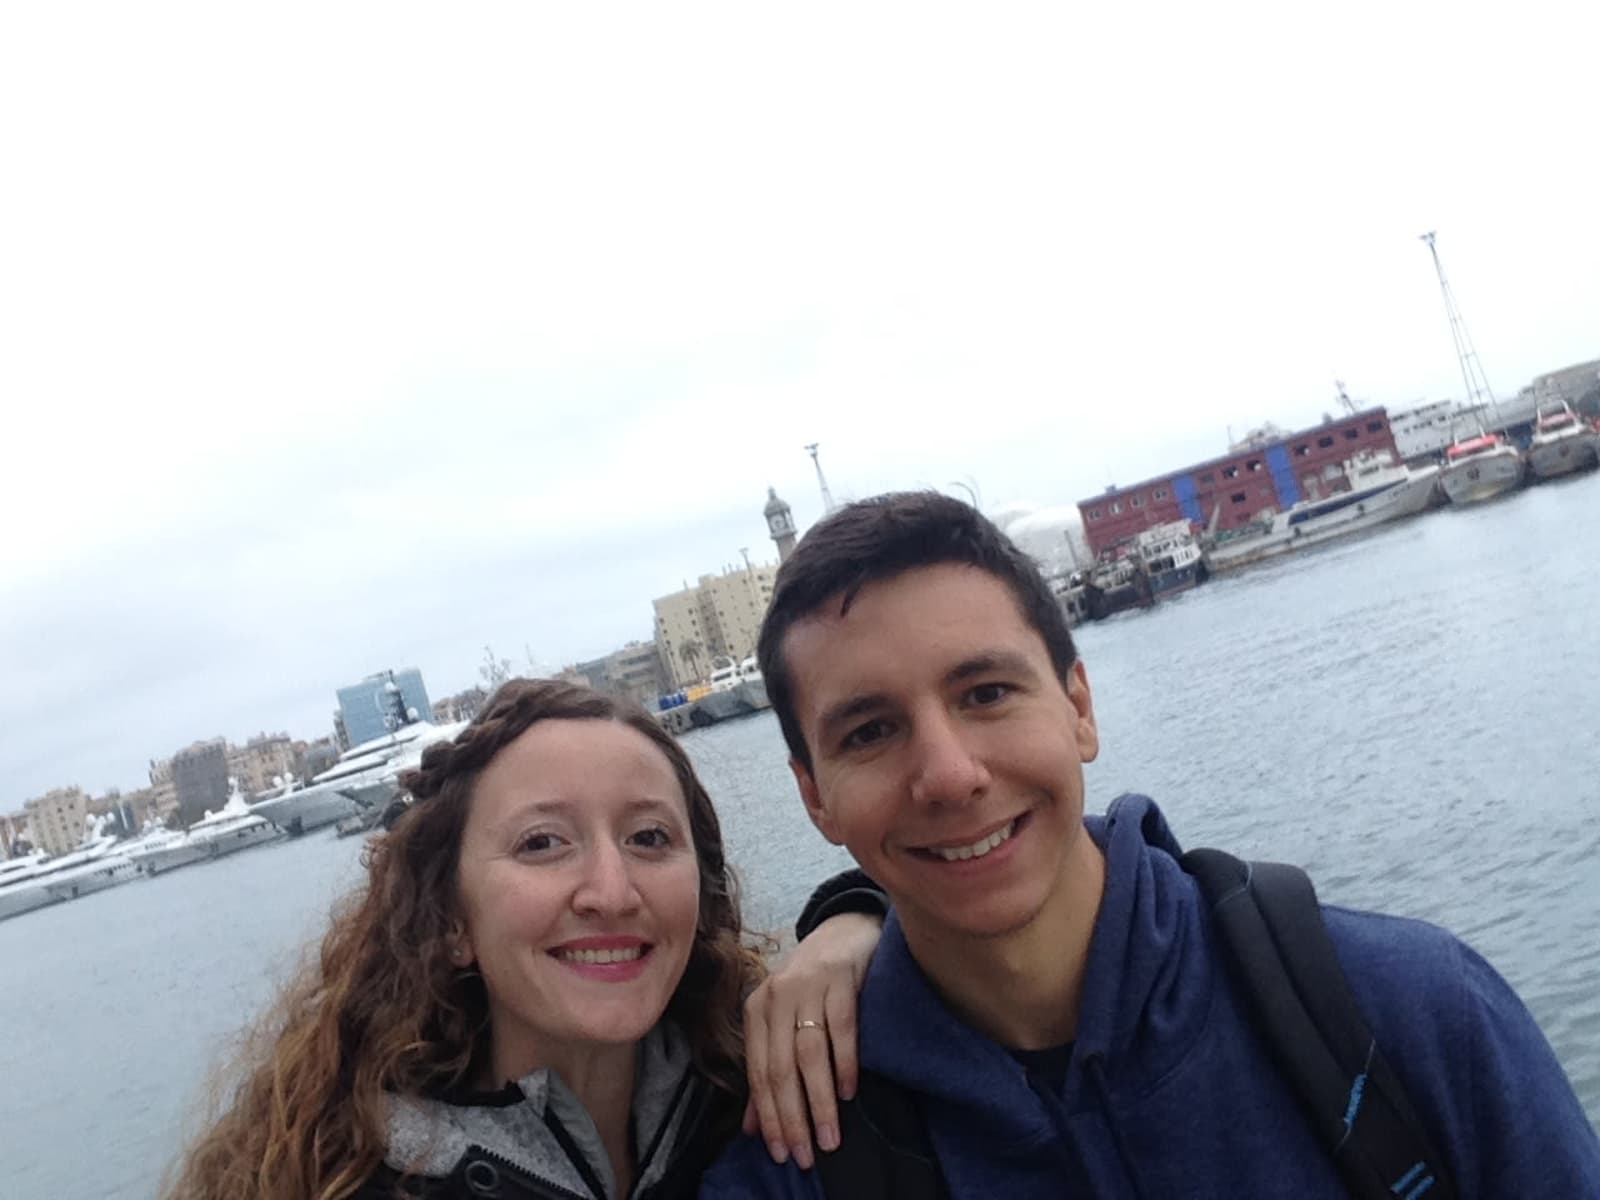 Jose luis & Ileana mailén from Comodoro Rivadavia, Argentina